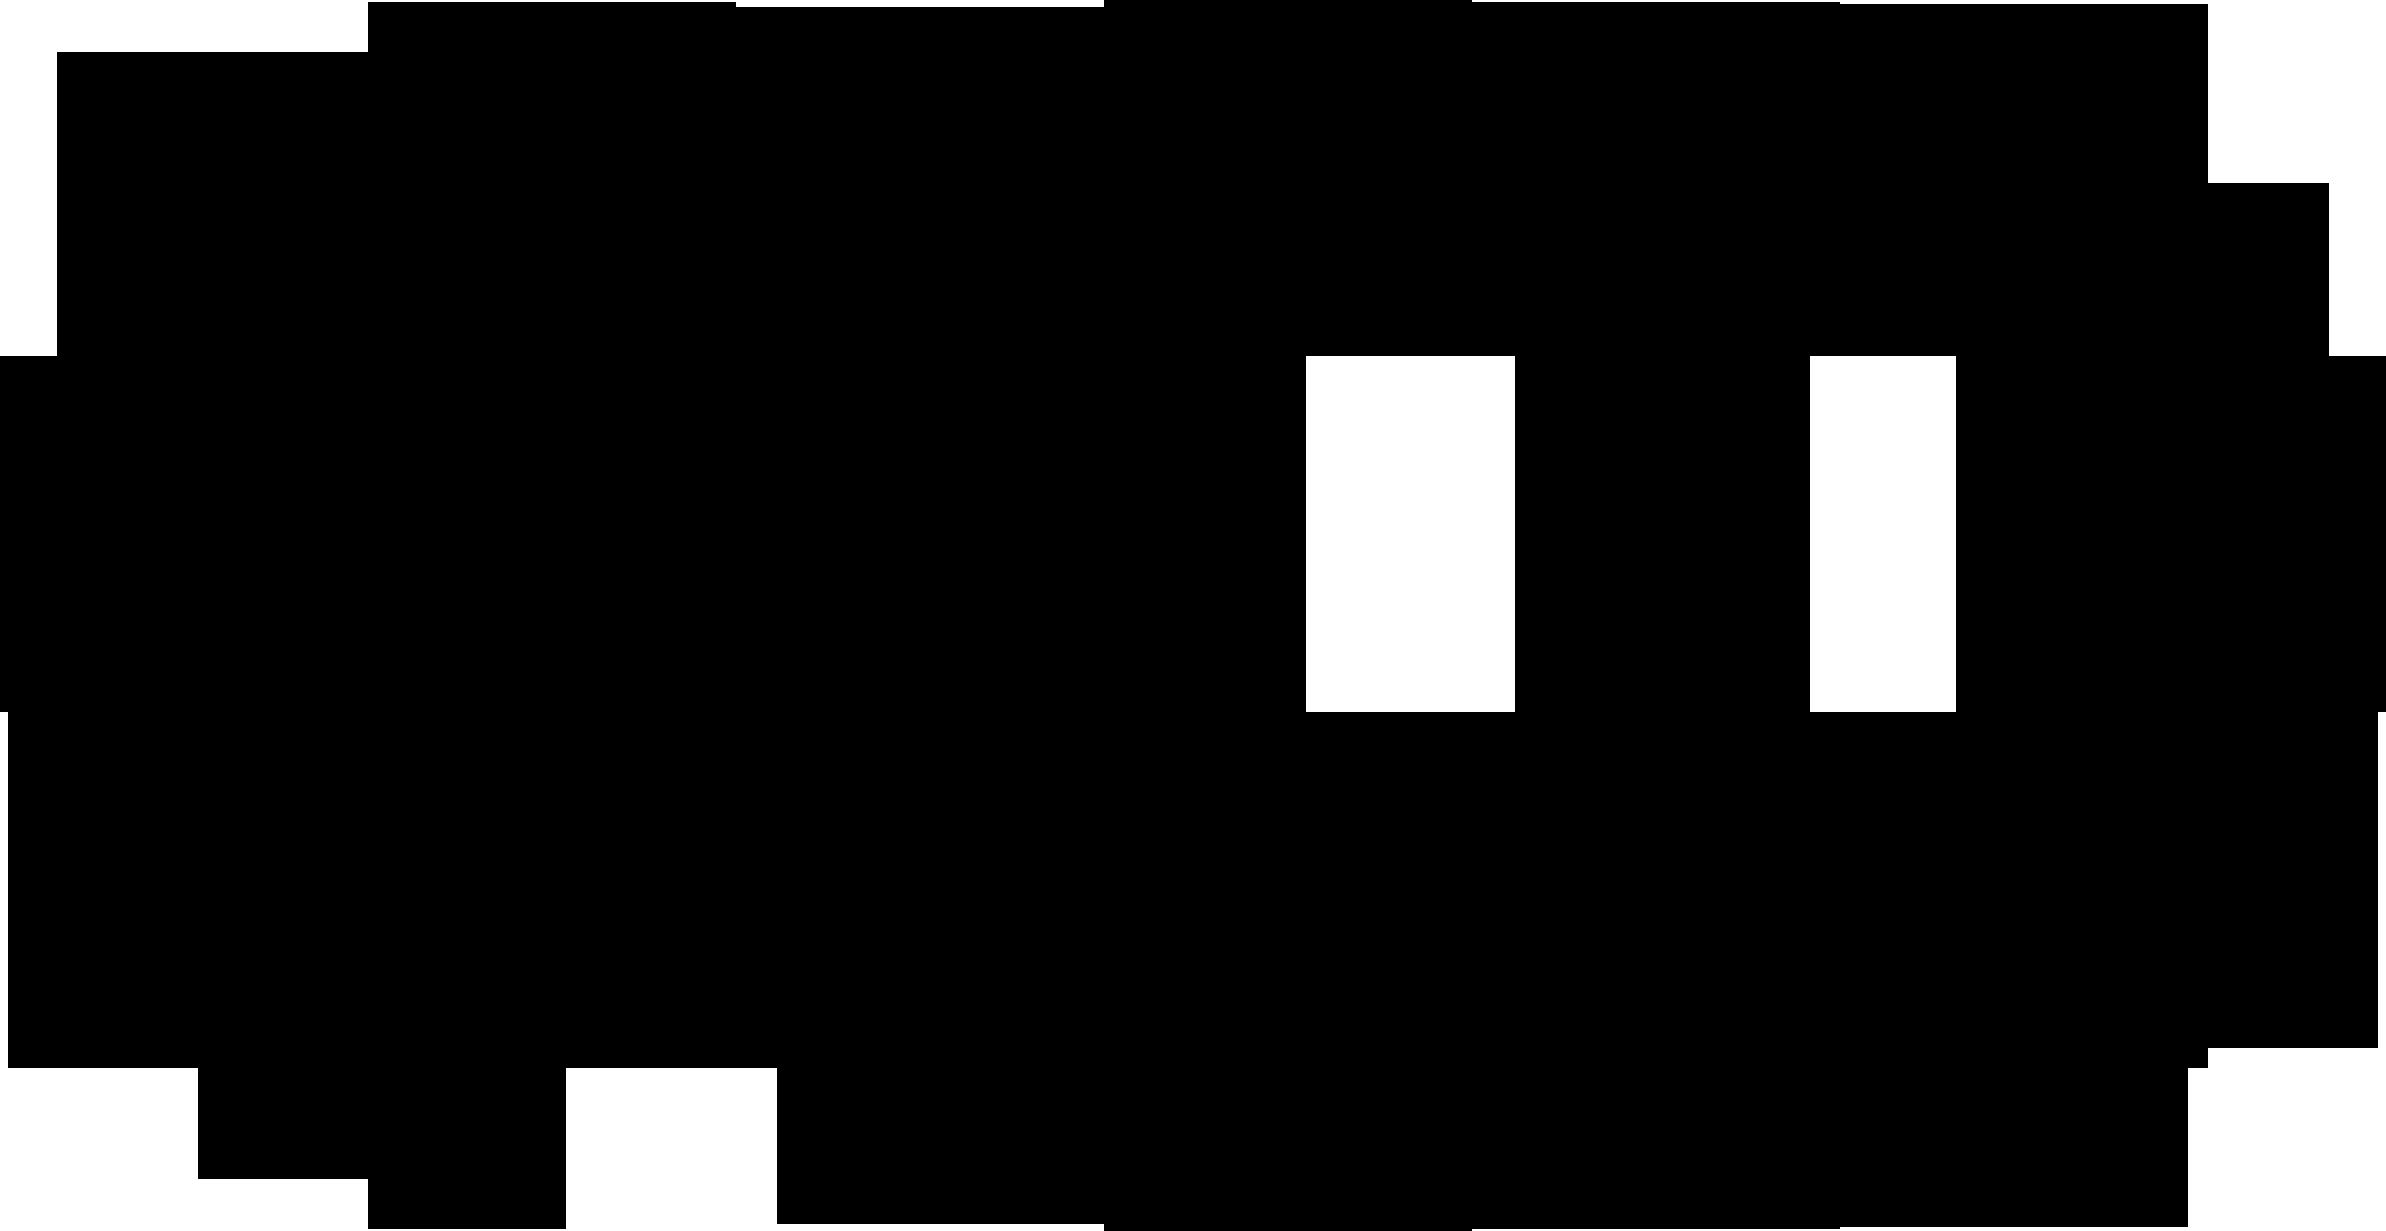 ТНТ (1998-2002, Чёрный логотип)